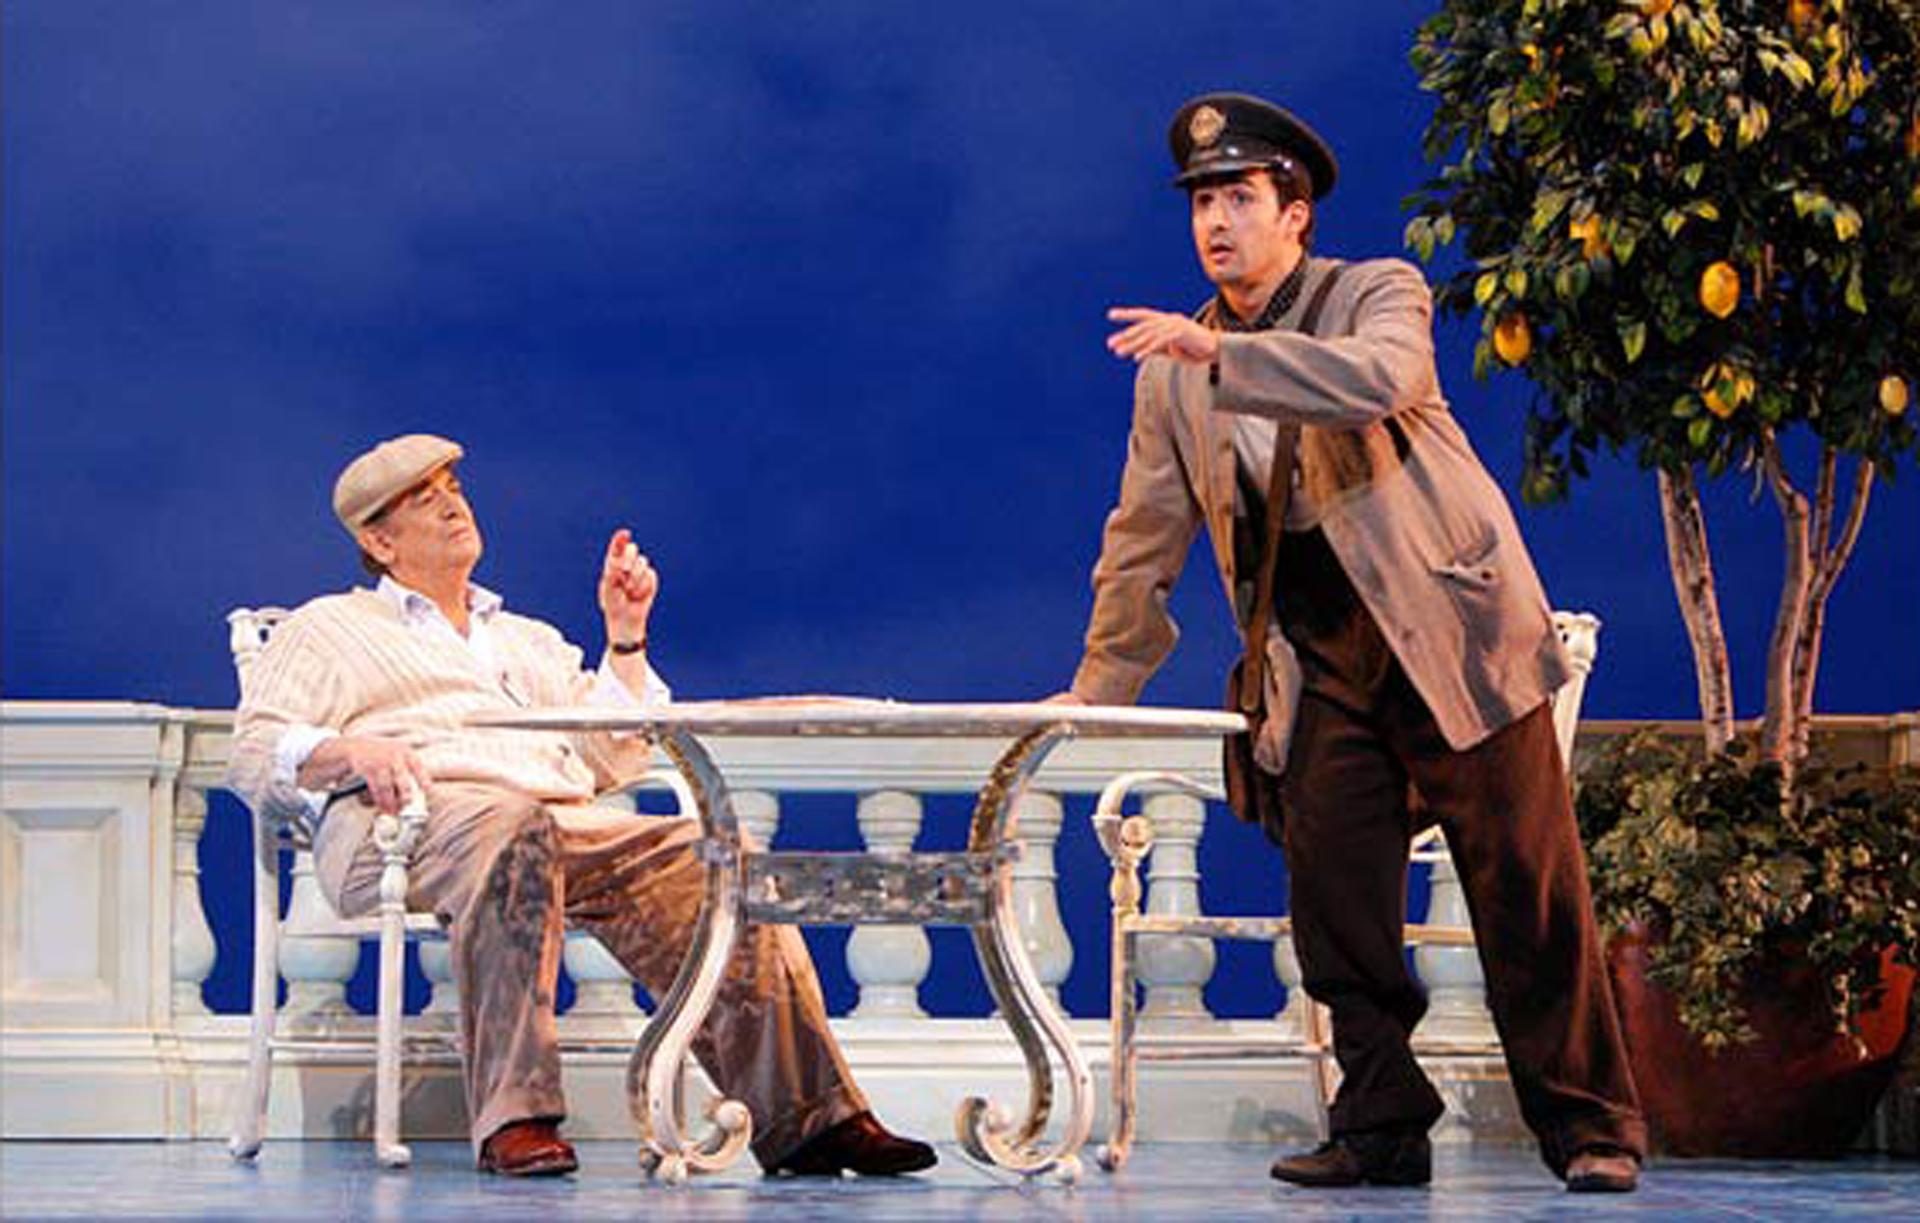 Plácido Domingo as Pablo Neruda and Charles Castronovo as Mario Ruoppolo in Il Postino.